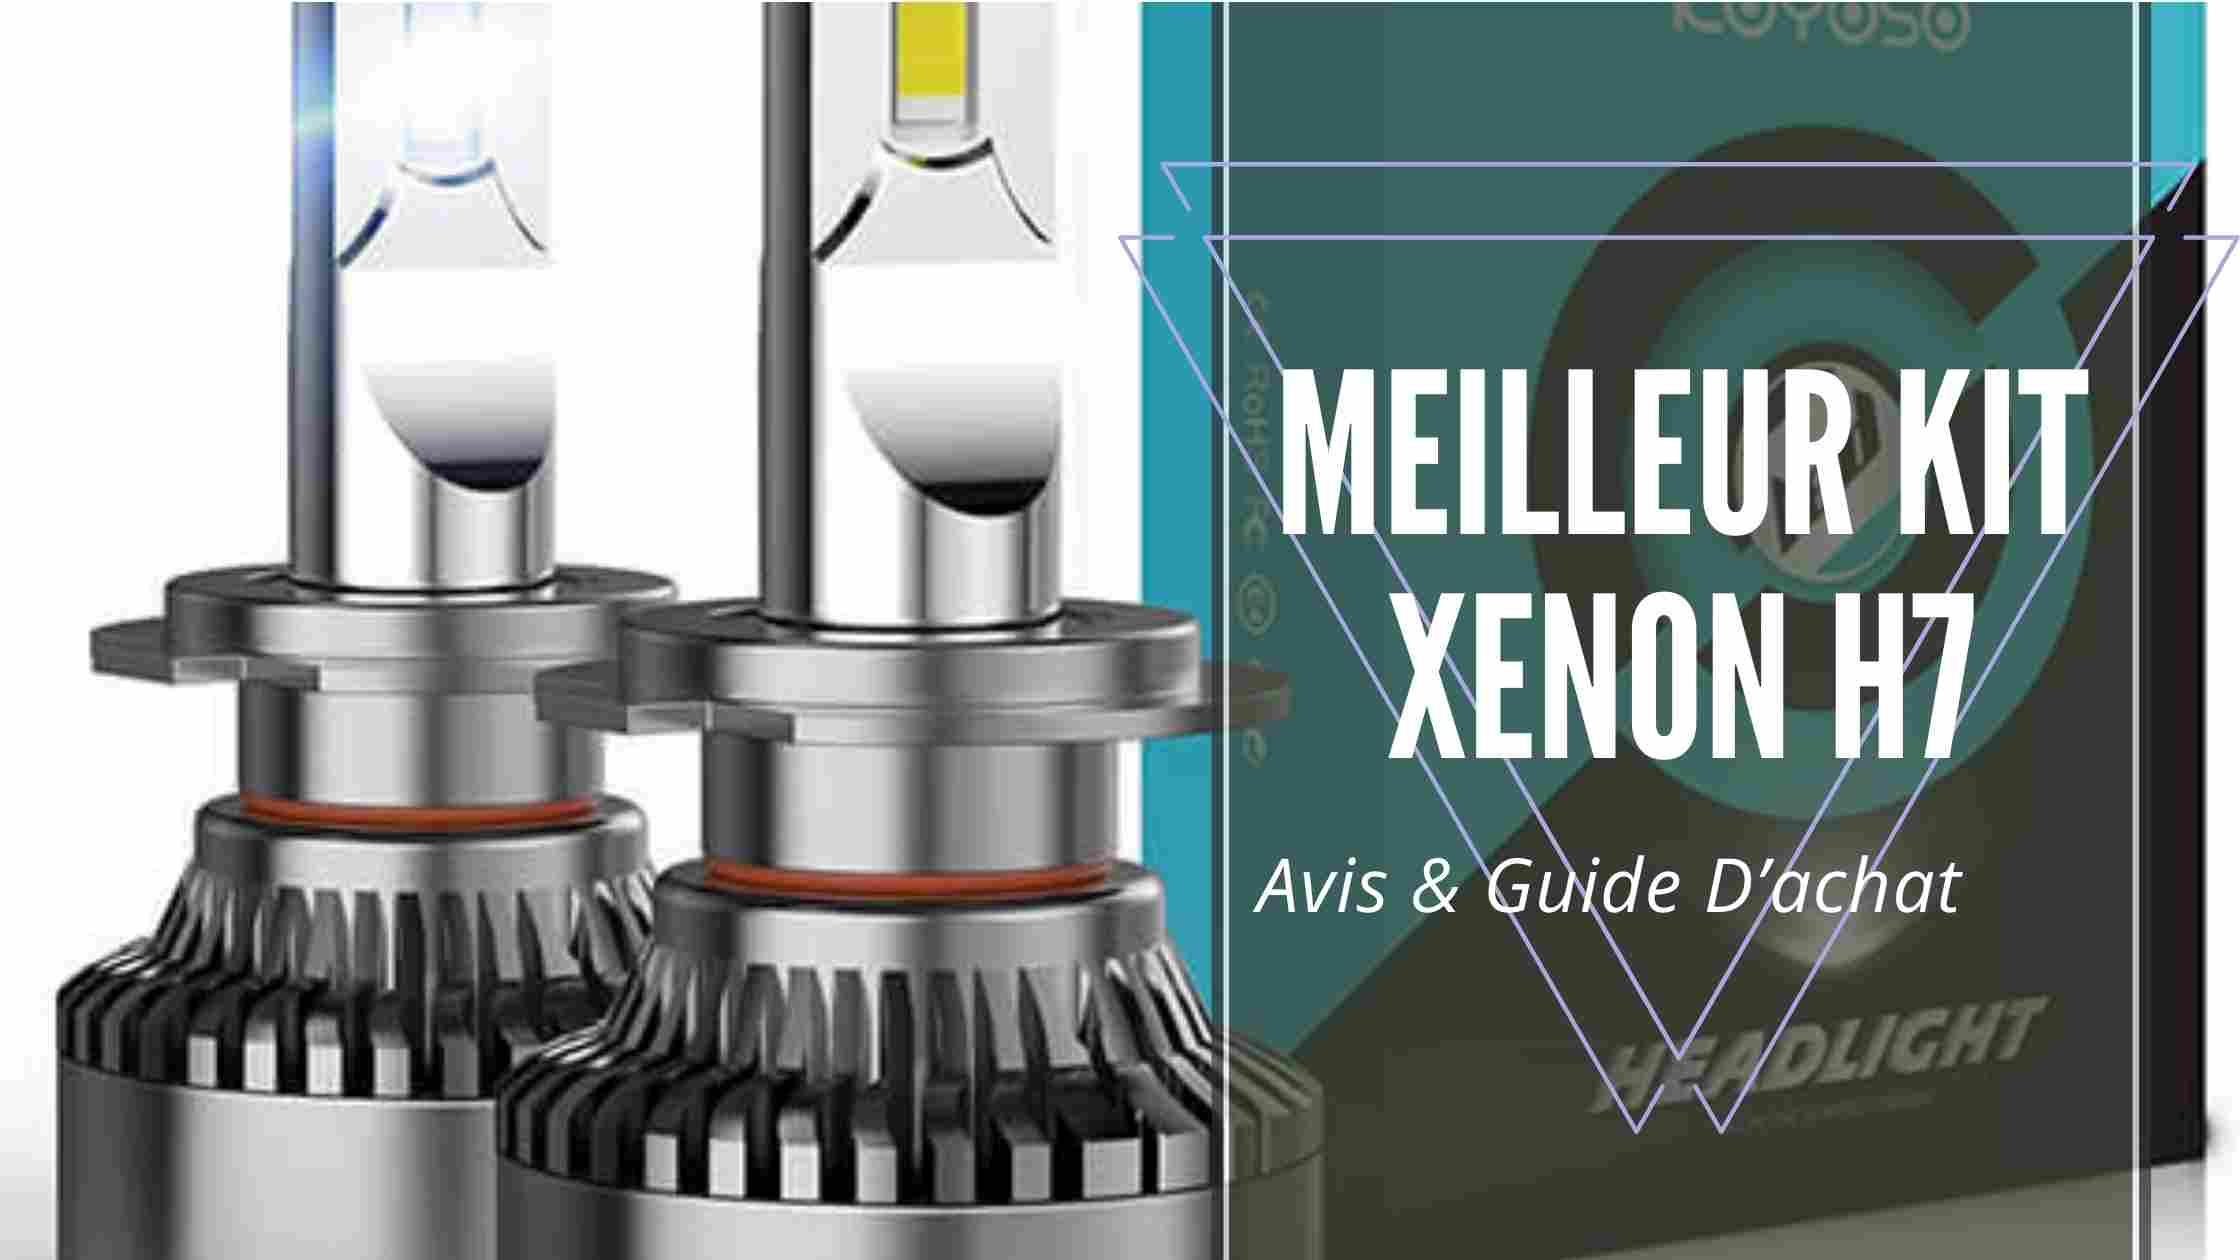 Meilleur Kit Xenon H7